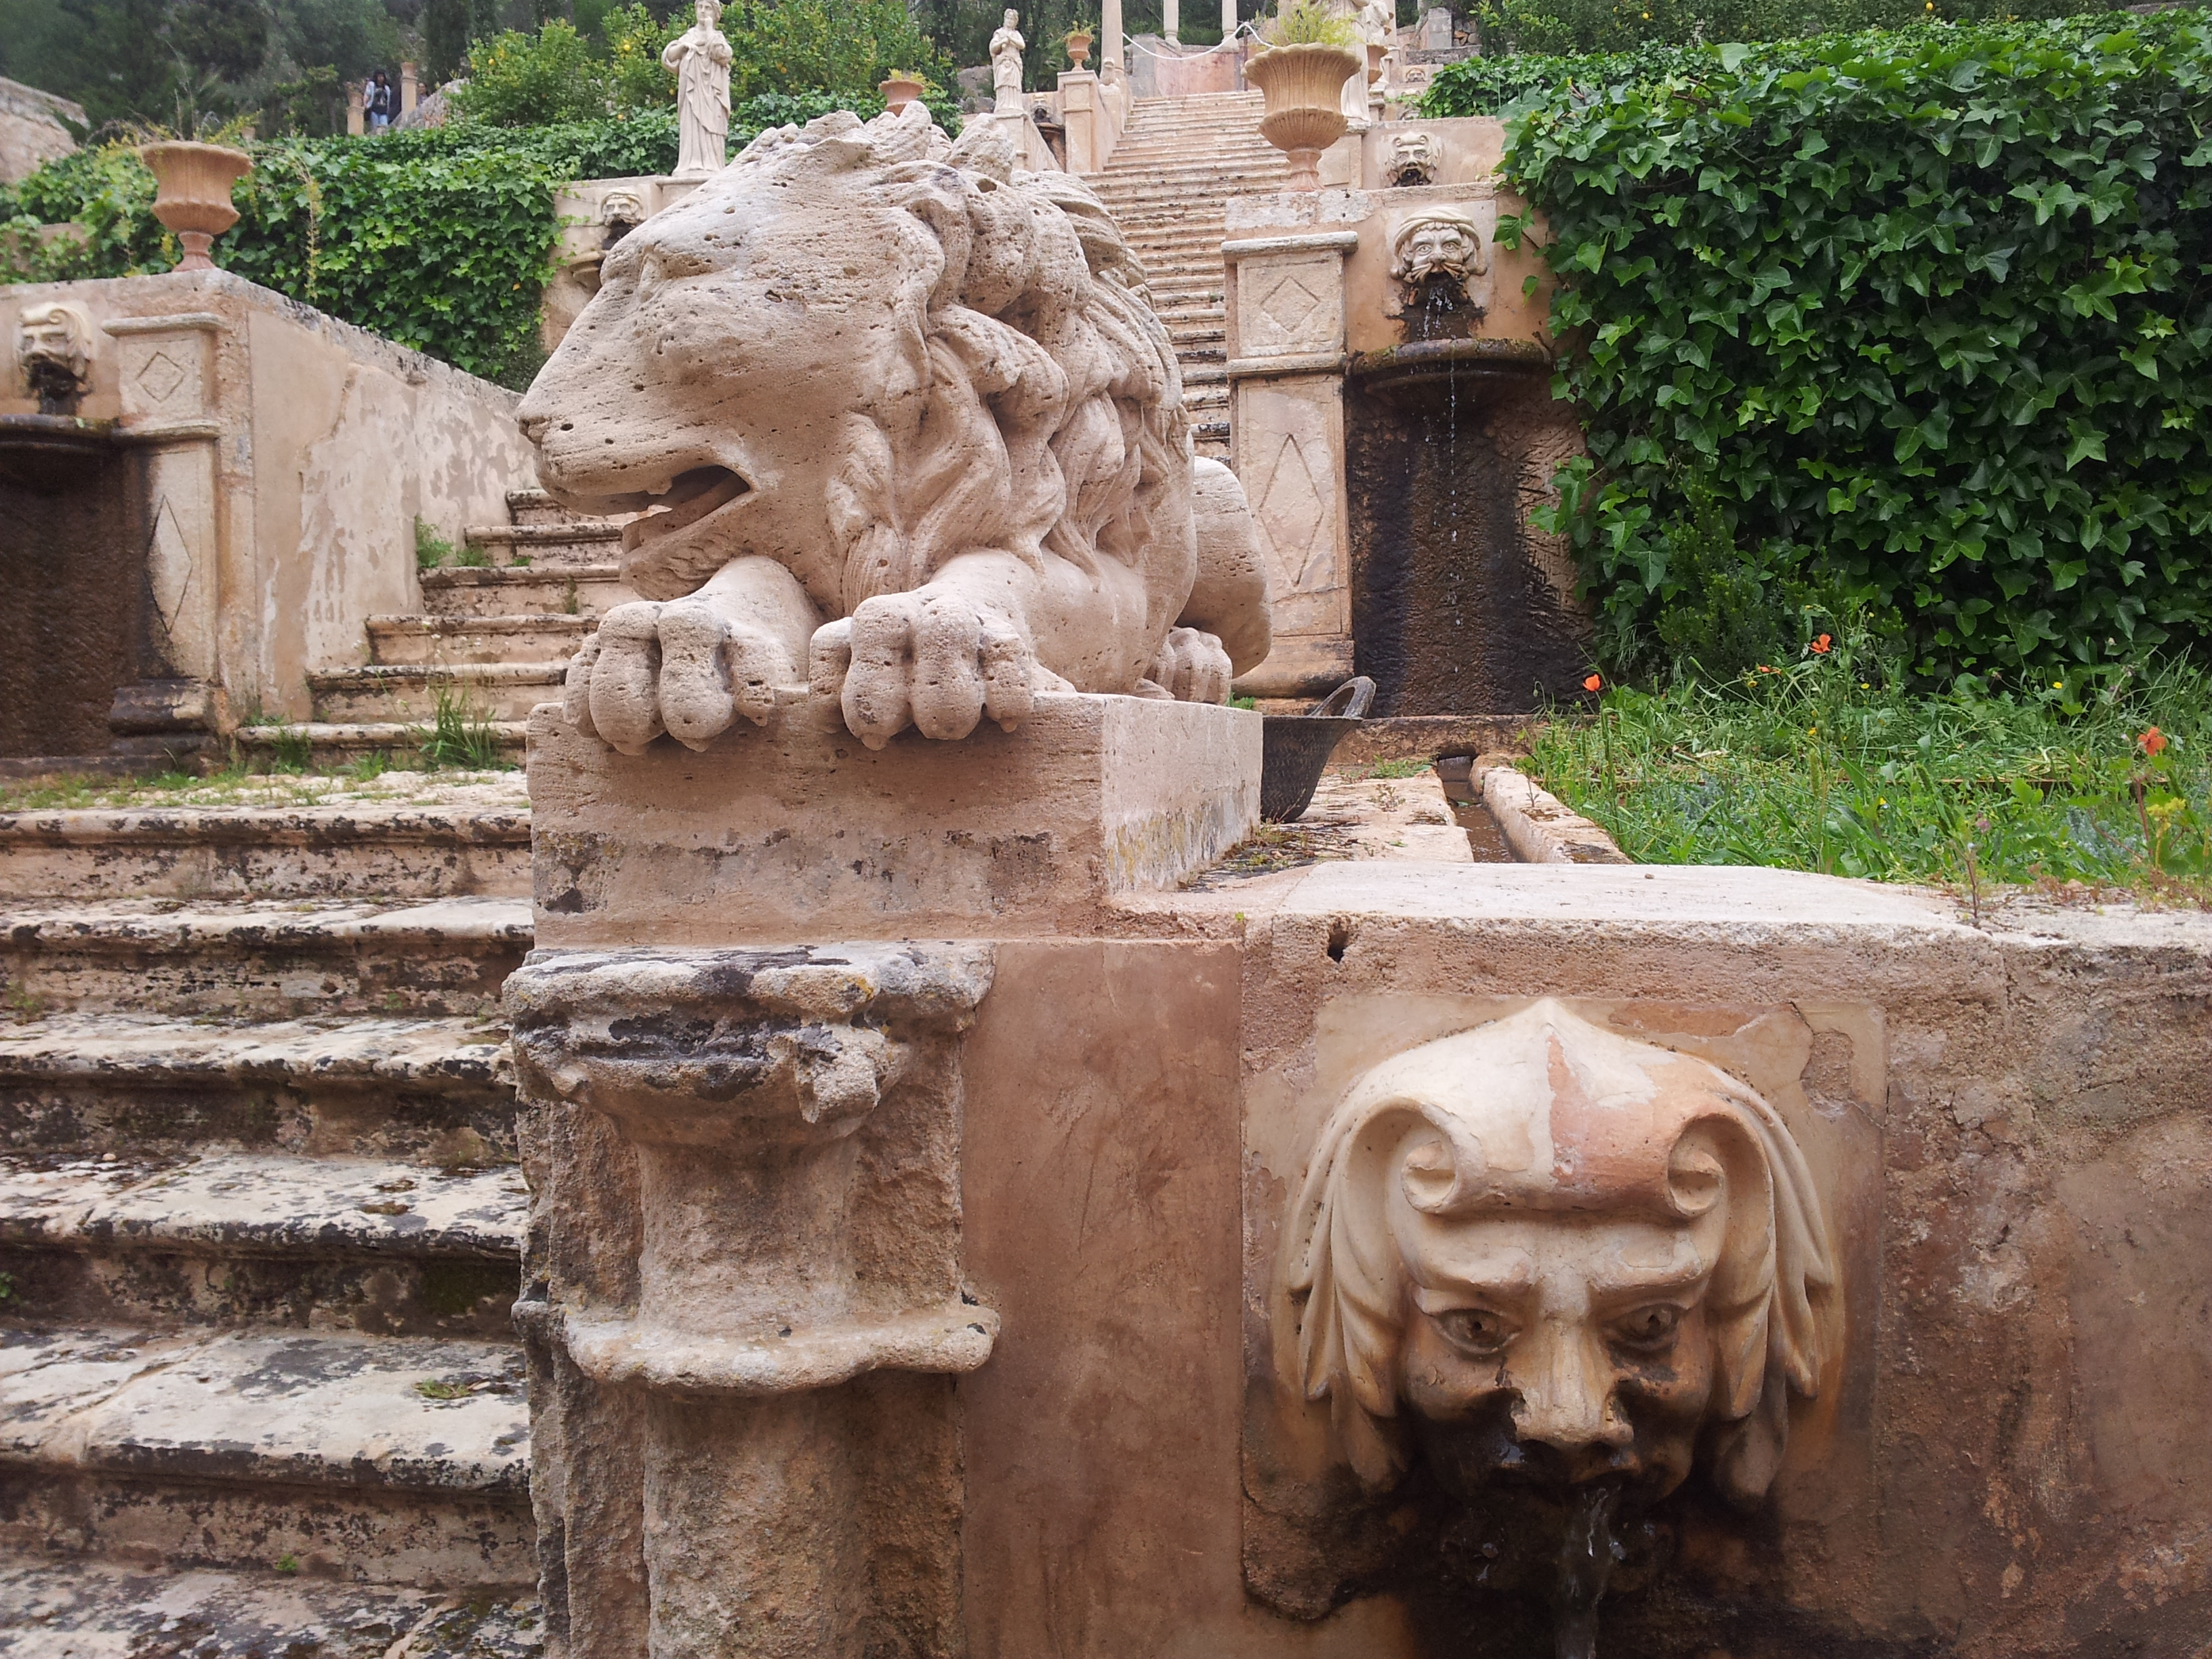 Raixa: Altes Landgut auf Mallorca